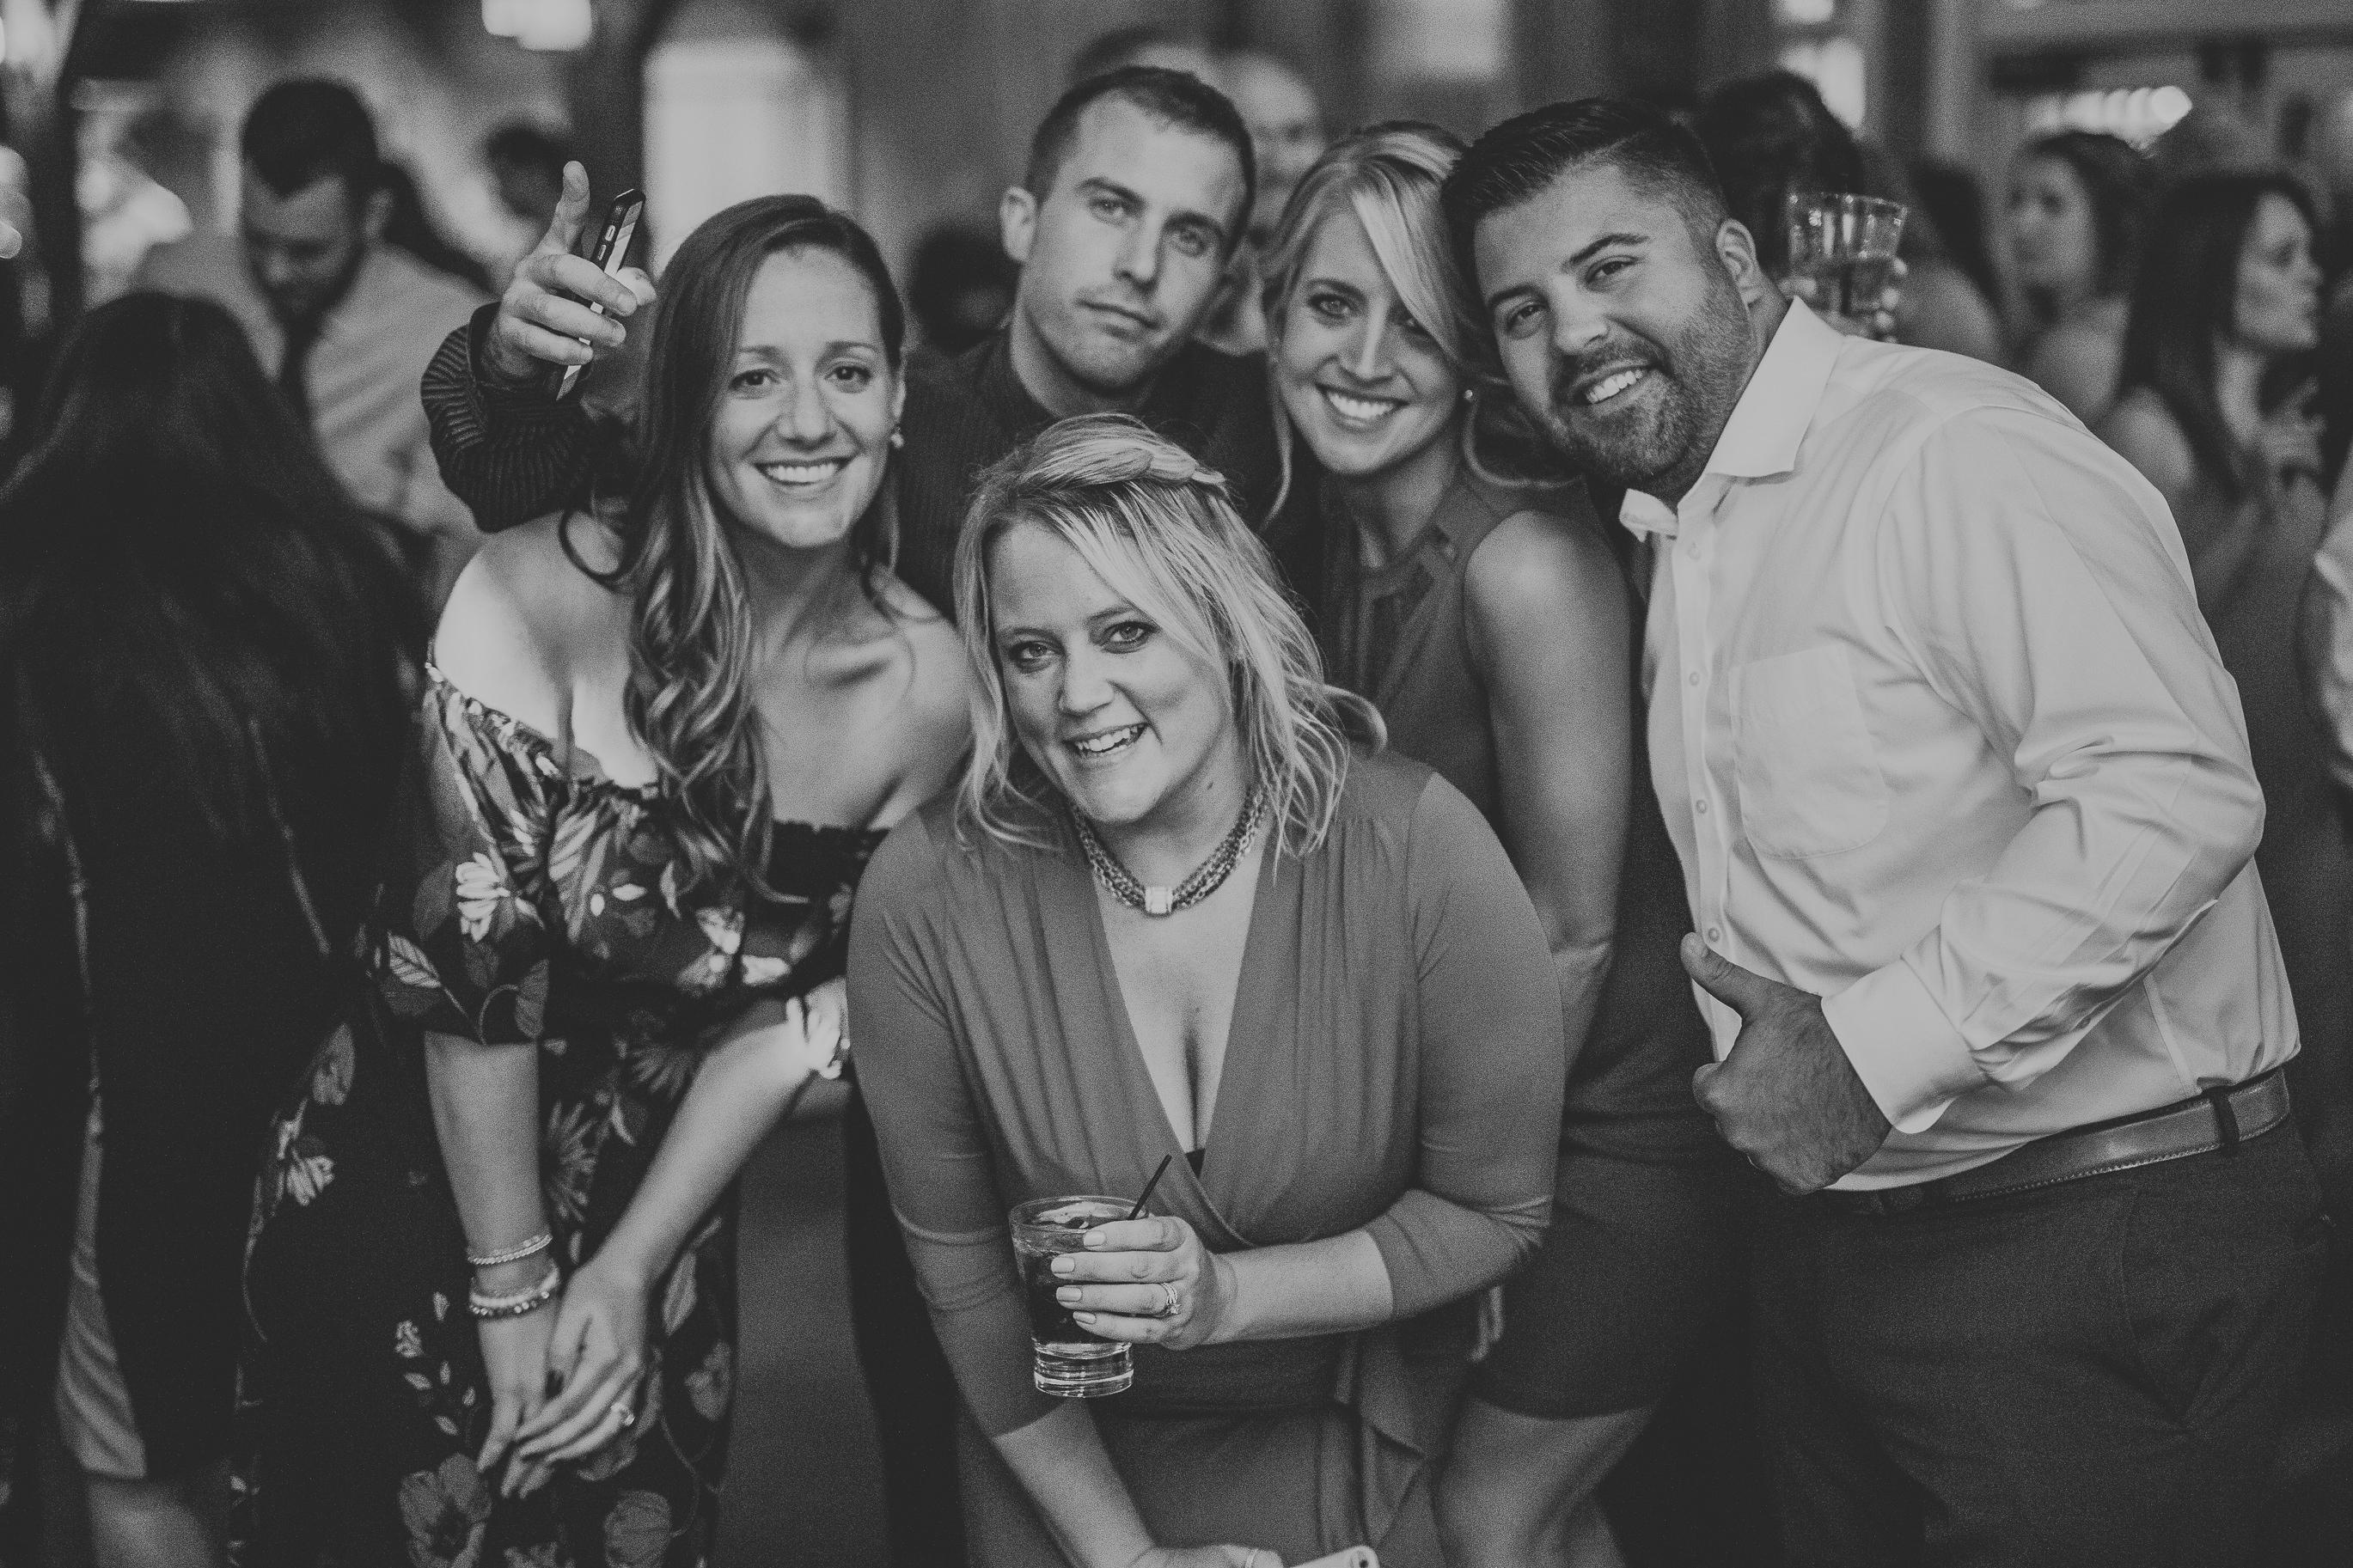 intimate wedding, orchard, Berkshires, wedding photographer, destination wedding photographer, fall wedding, Boston wedding photographer, boho wedding, intimate wedding, outdoor wedding